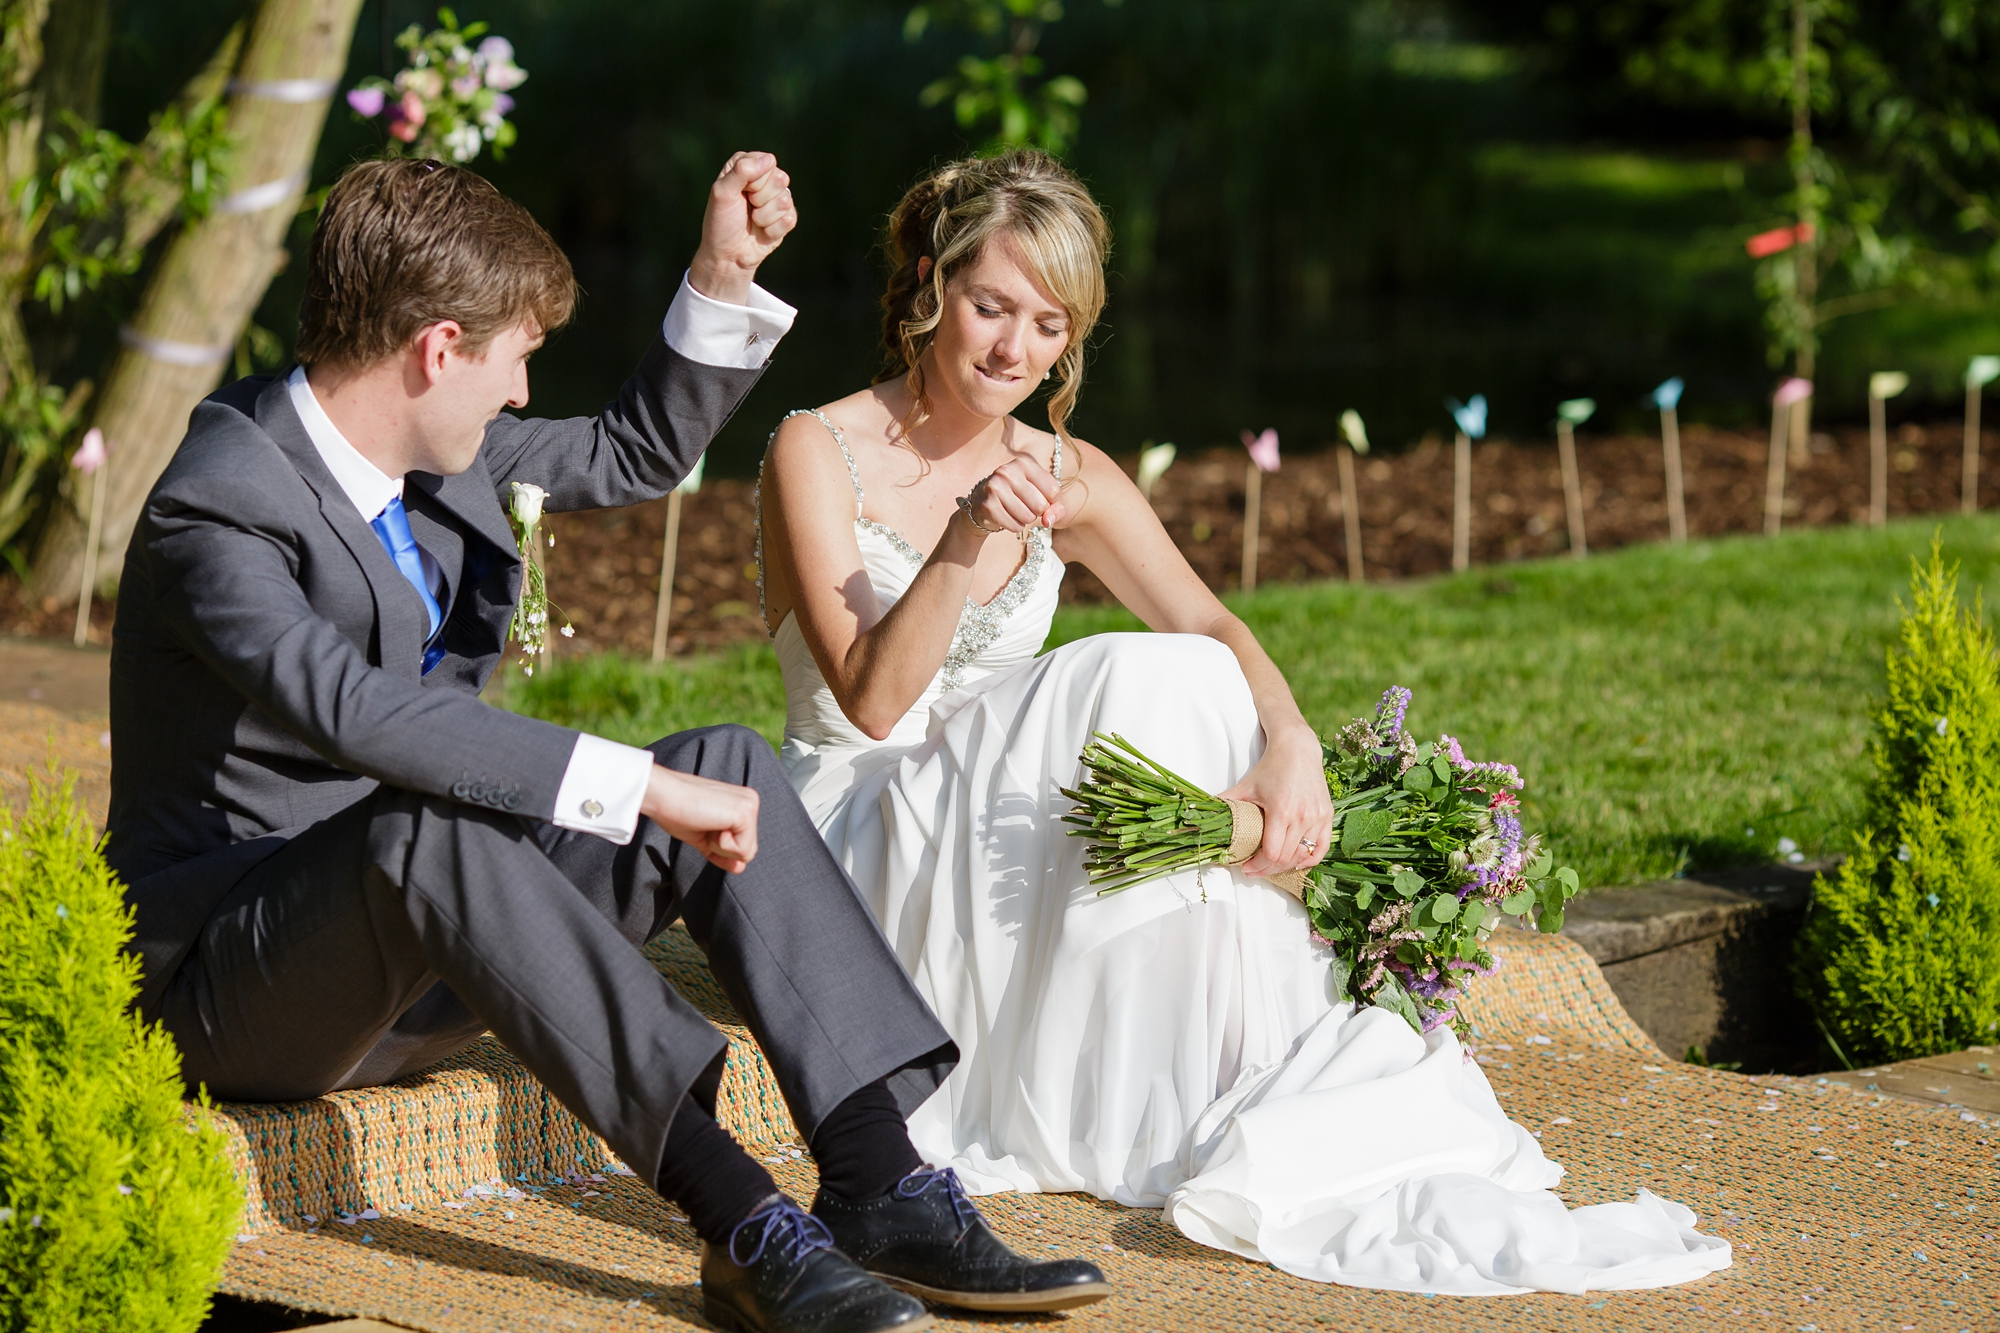 Villa Farm Weddings bride and groom fist bump